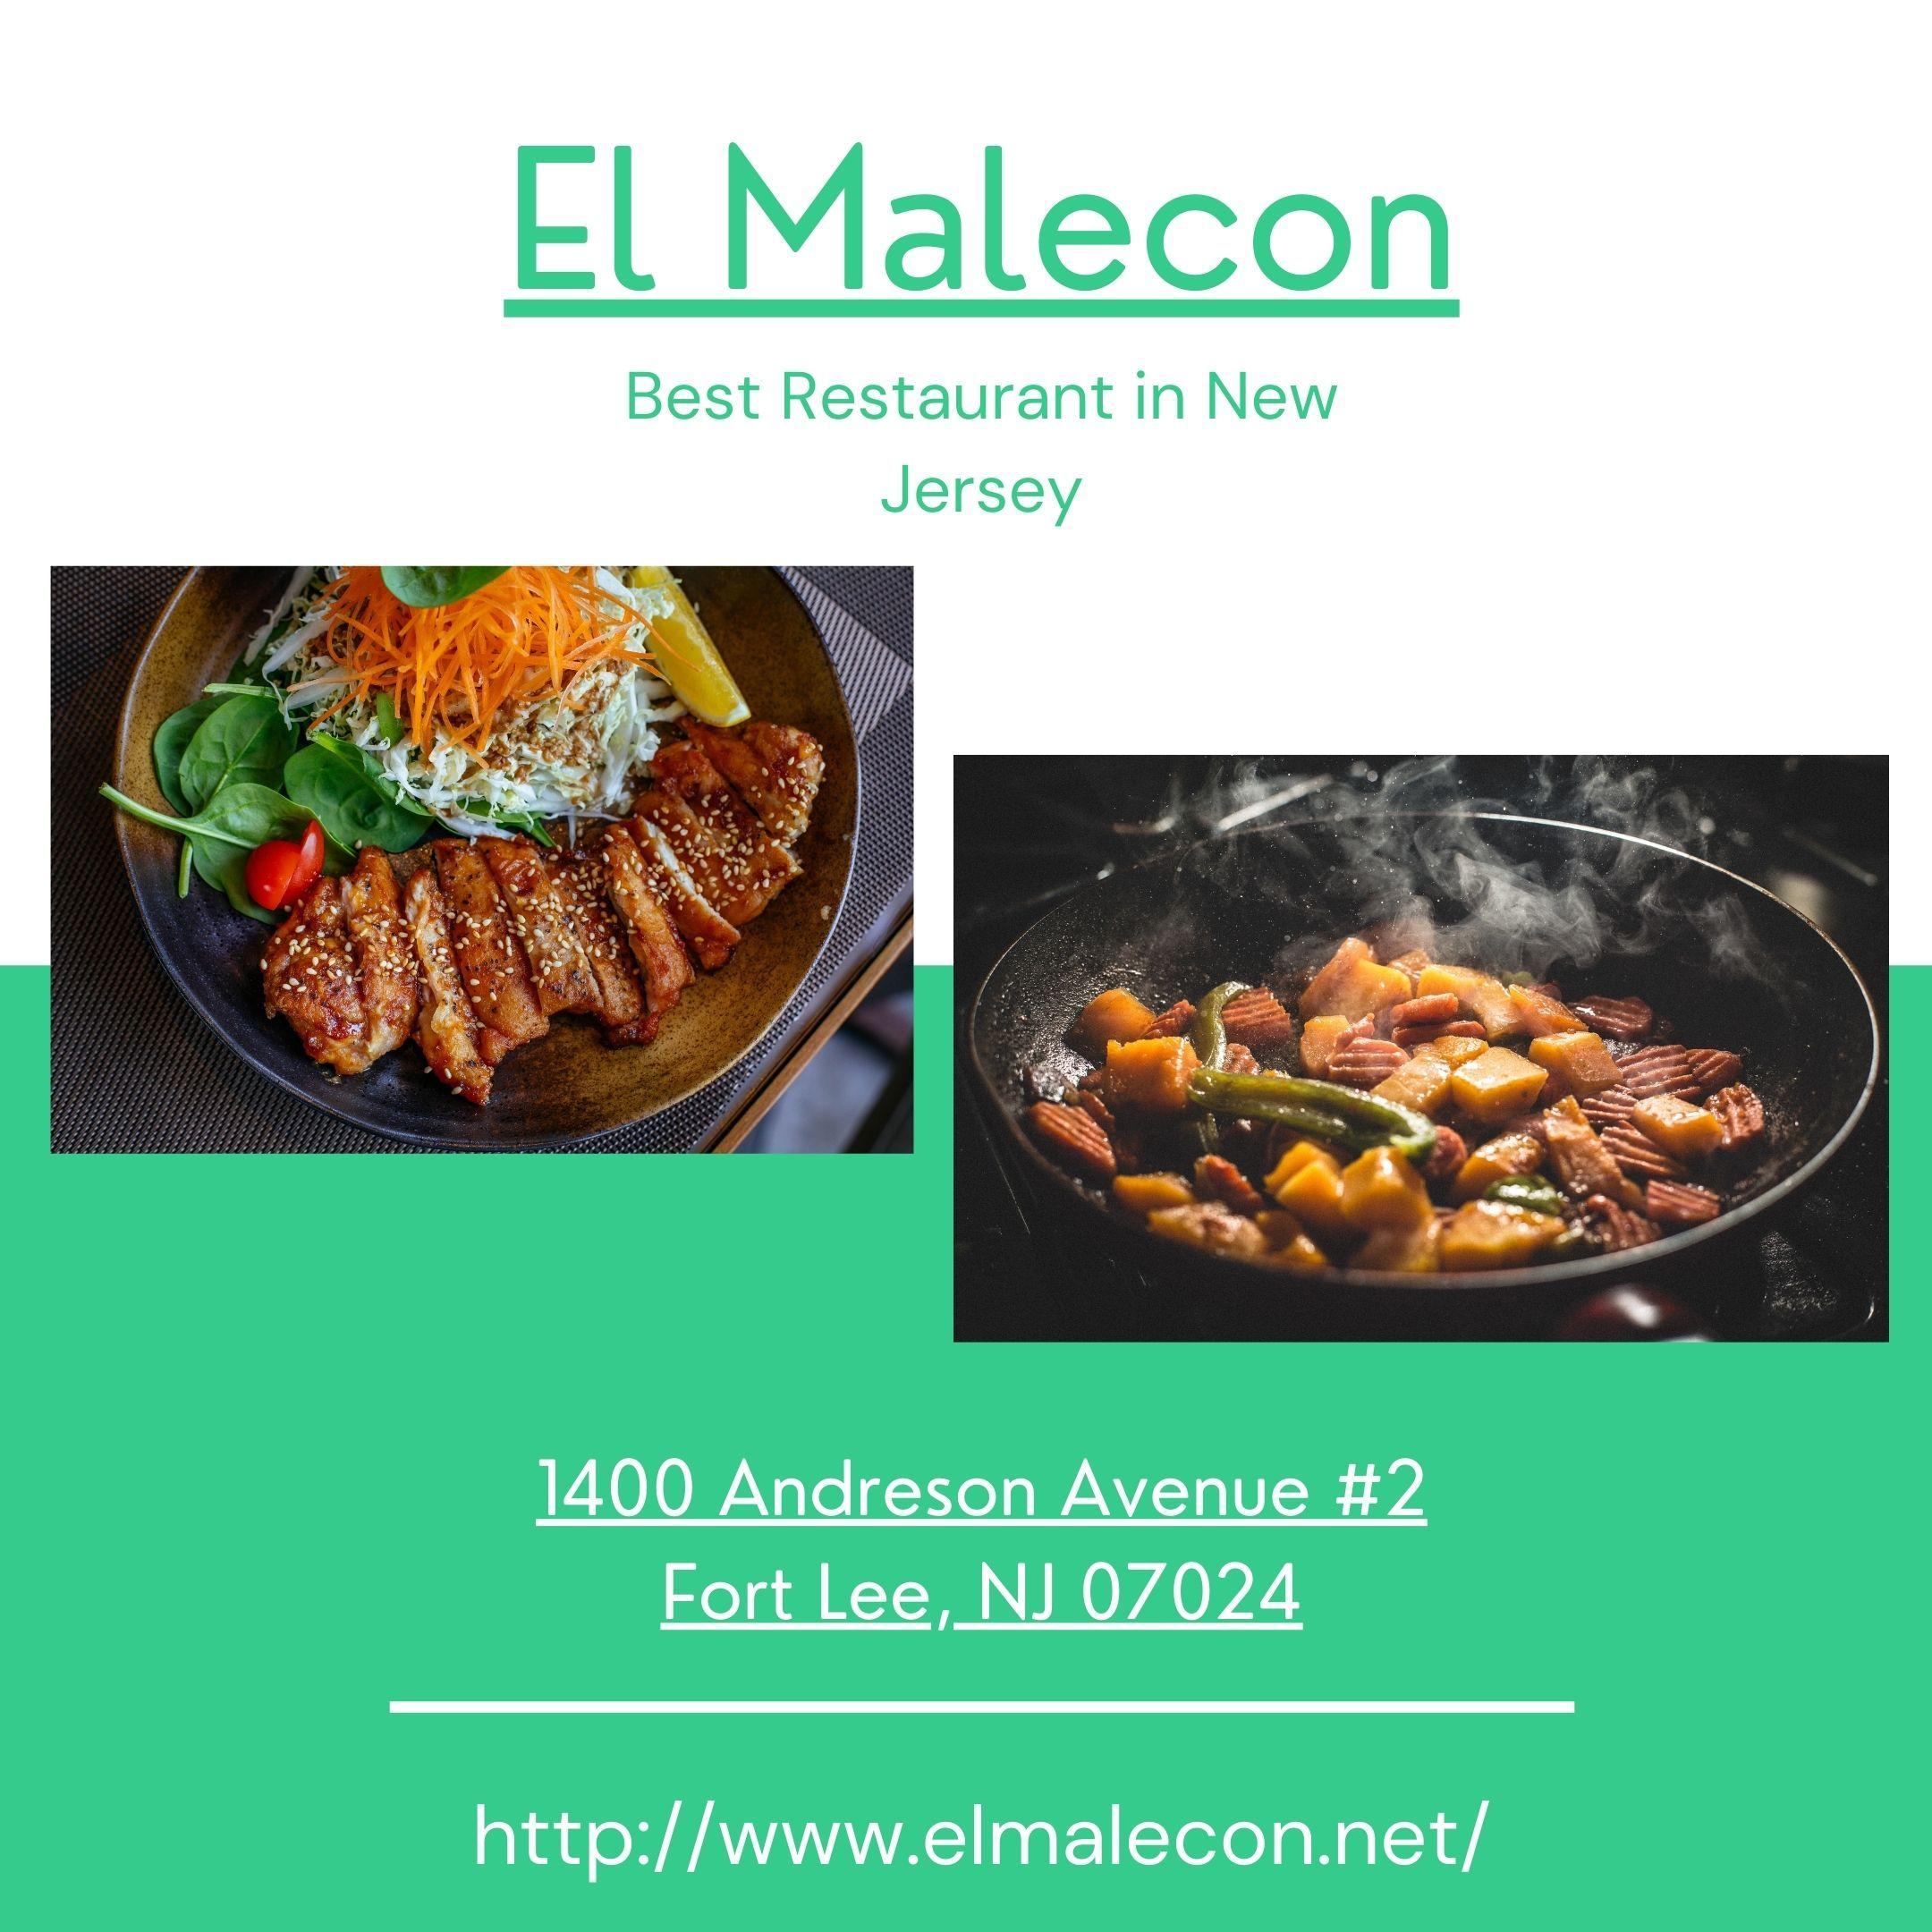 Best Restaurants In Fort Lee Nj In 2020 Food Experiences Food Dominican Food